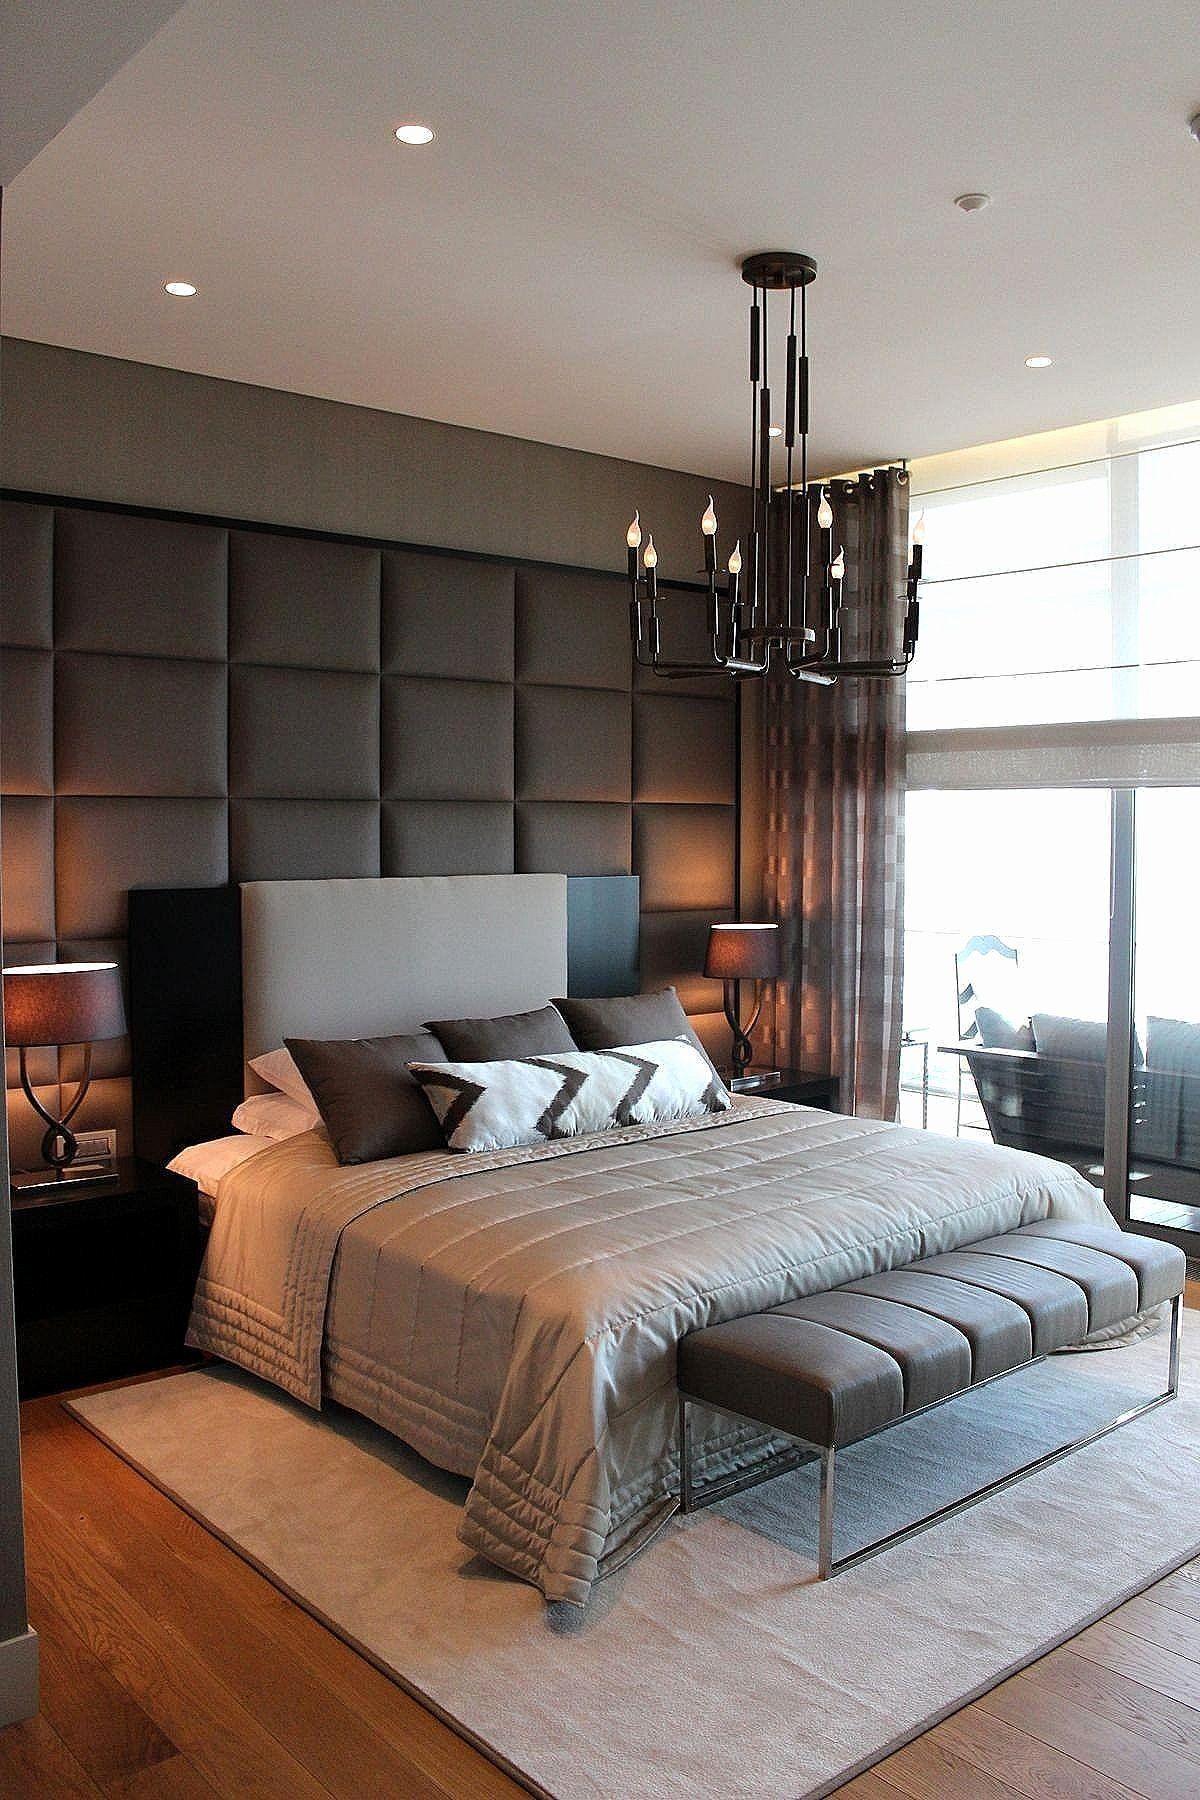 Bedroom Ideas For Kids Fresh Kids Bedroom Sets Originals Ideas Good Elegant Saltandblues Modern Master Bedroom Bedroom Furniture Design Luxurious Bedrooms